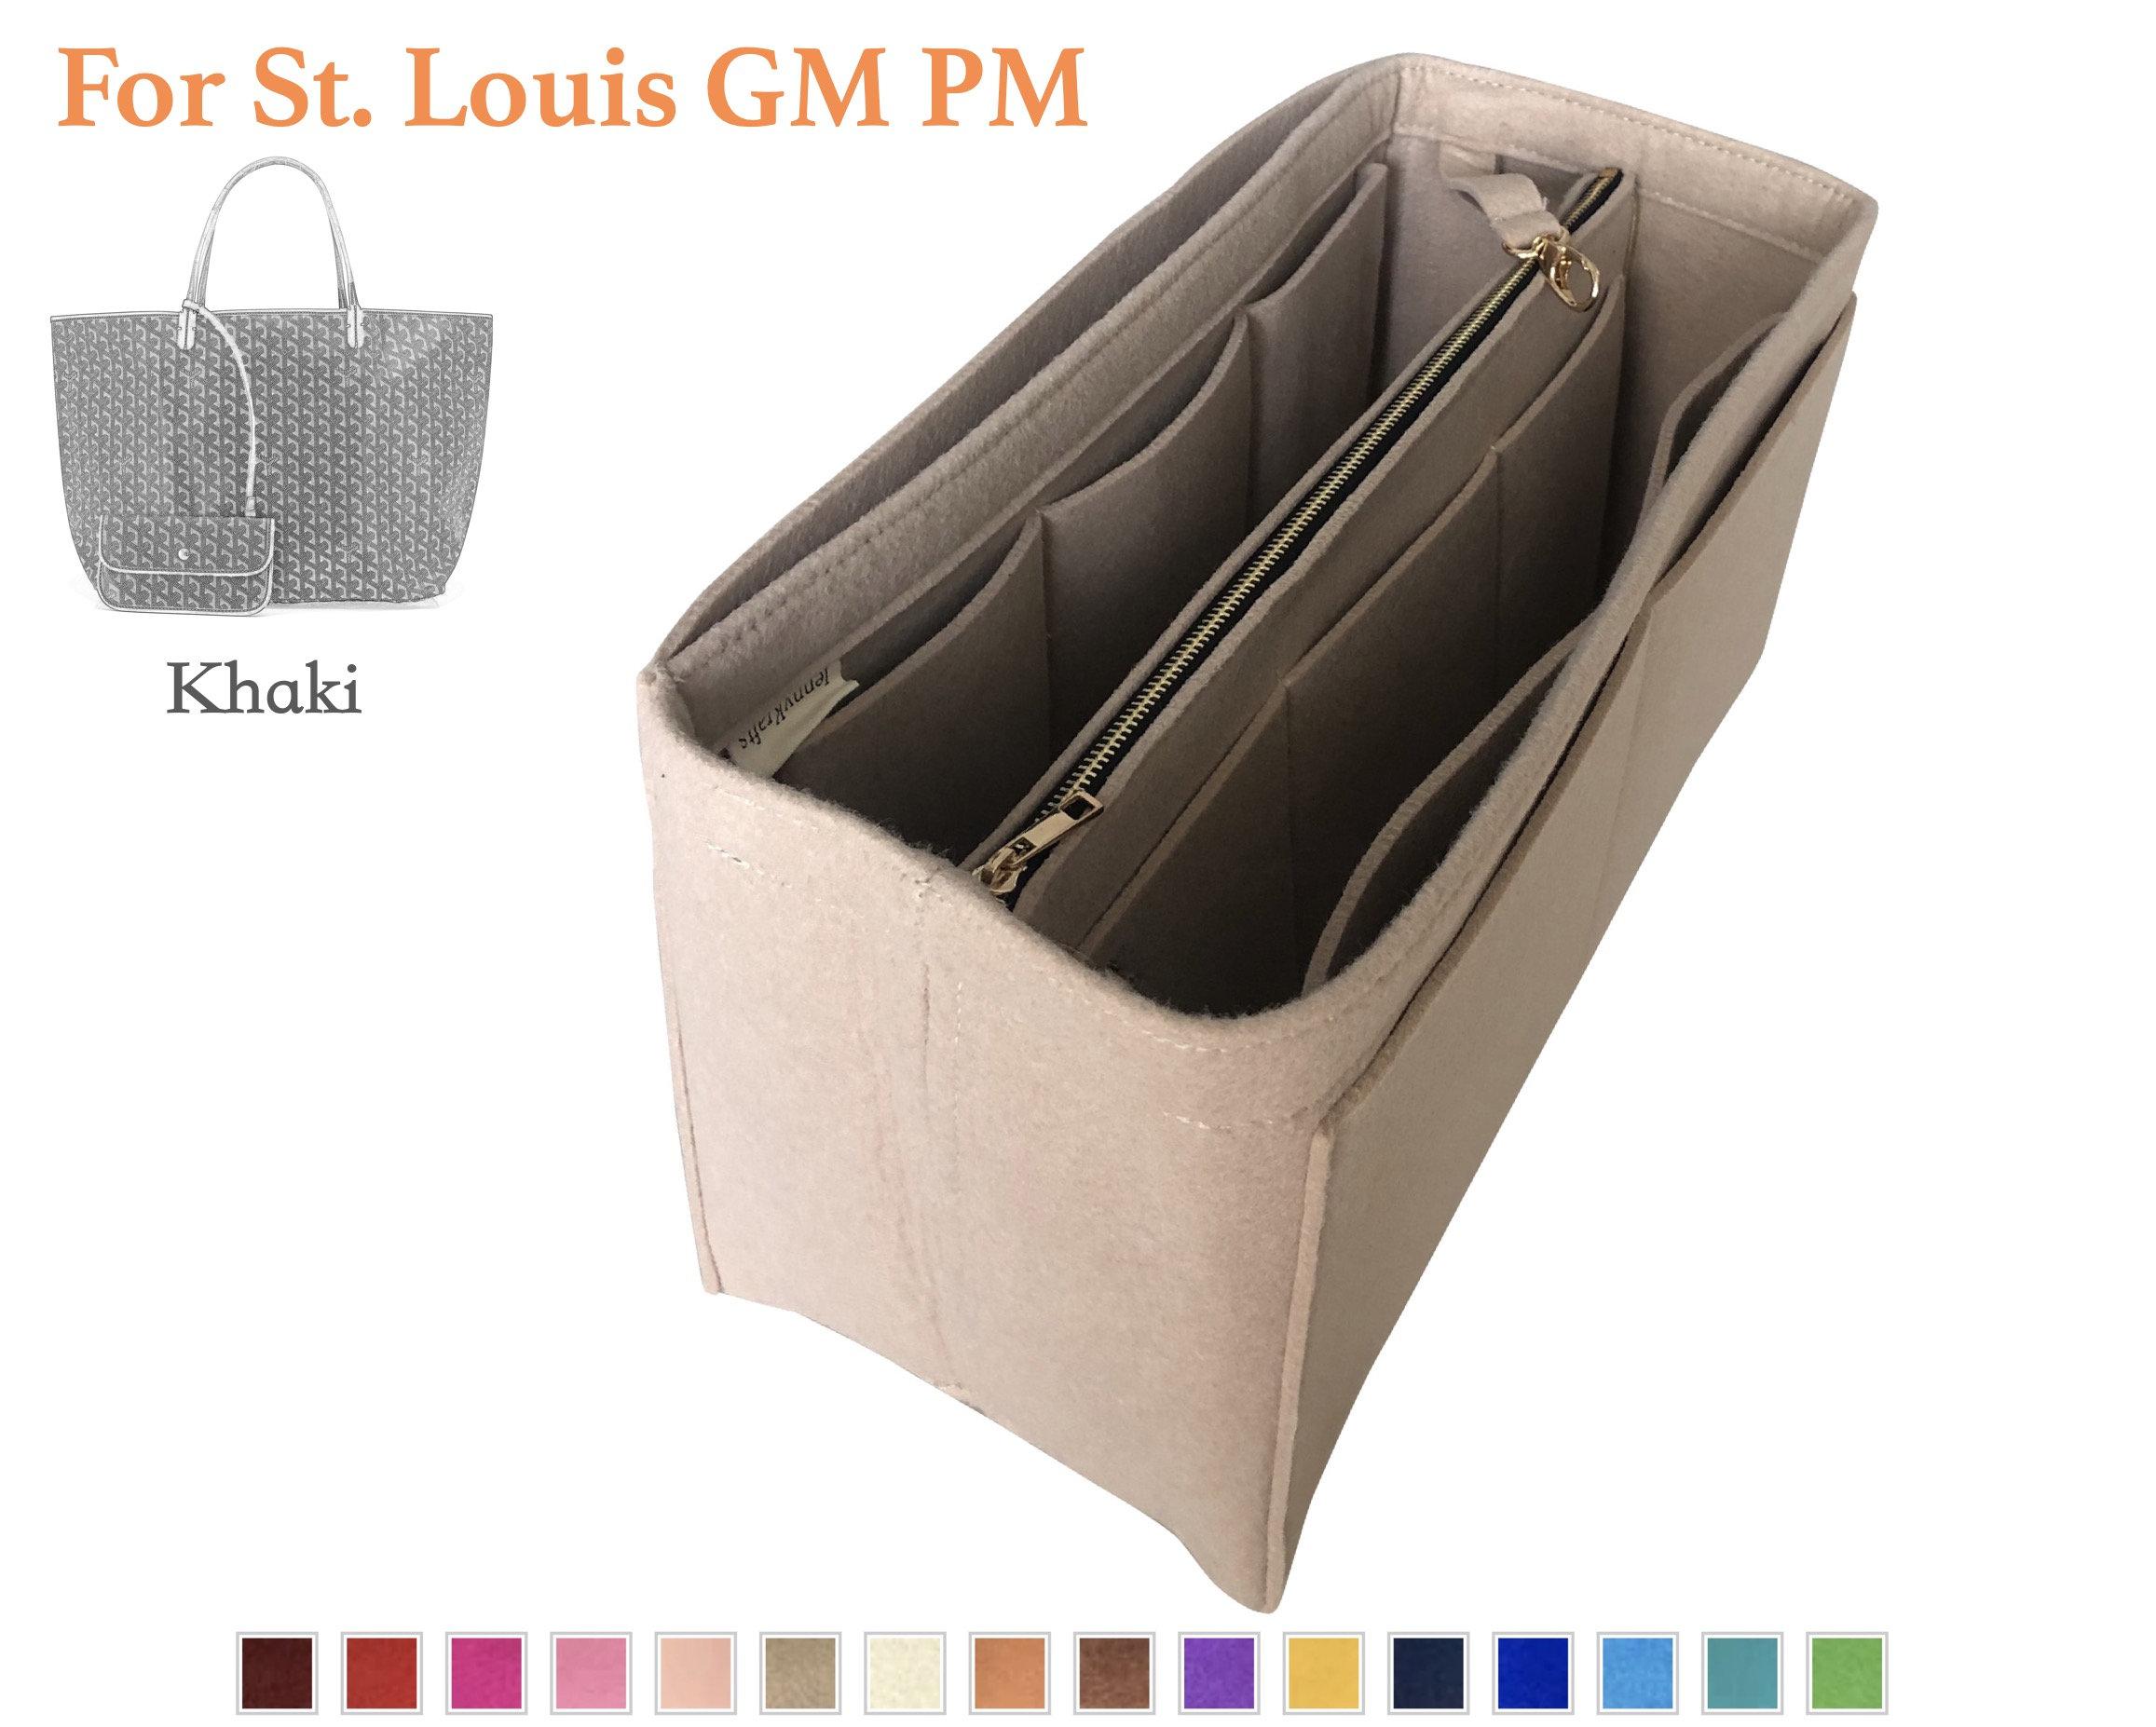 700750db57 Customizable Organizer (w/ Detachable Zipper Bag), Tote Felt Purse ...